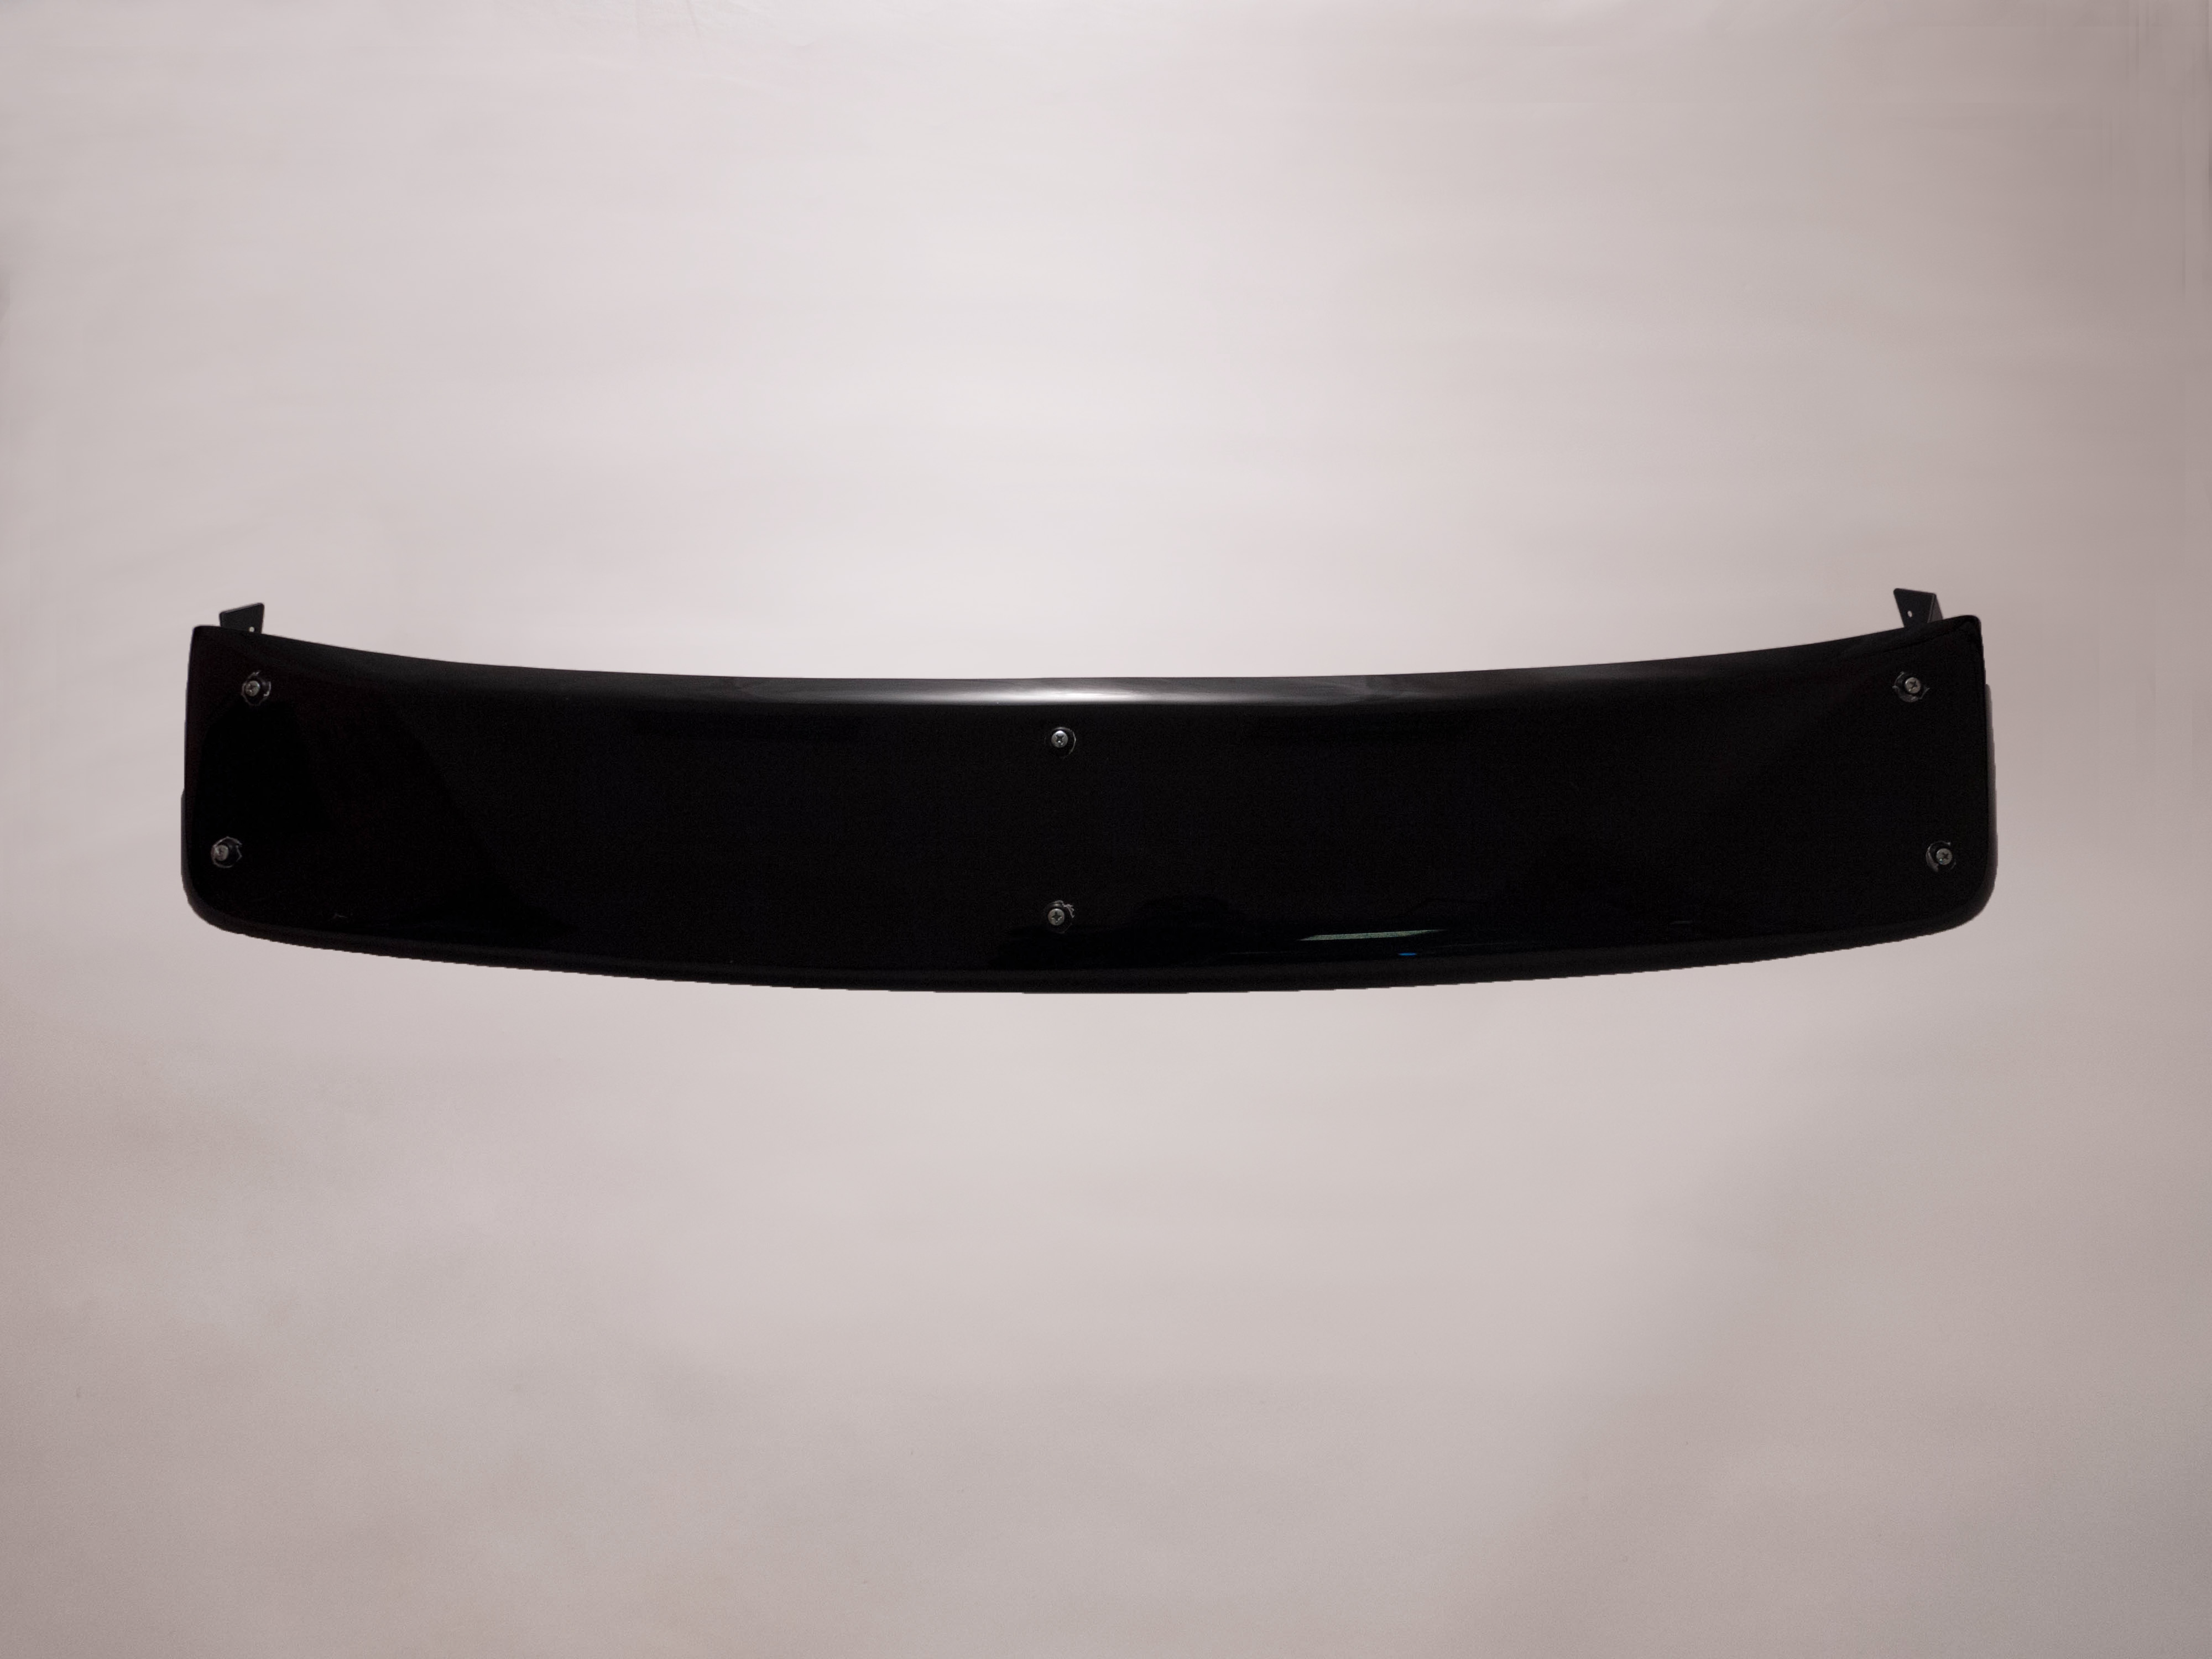 Sentinel Exterior Black Sun Visor Solid Acrylic Sun Shield for VW  Transporter T4 (90-03 38484be85cf